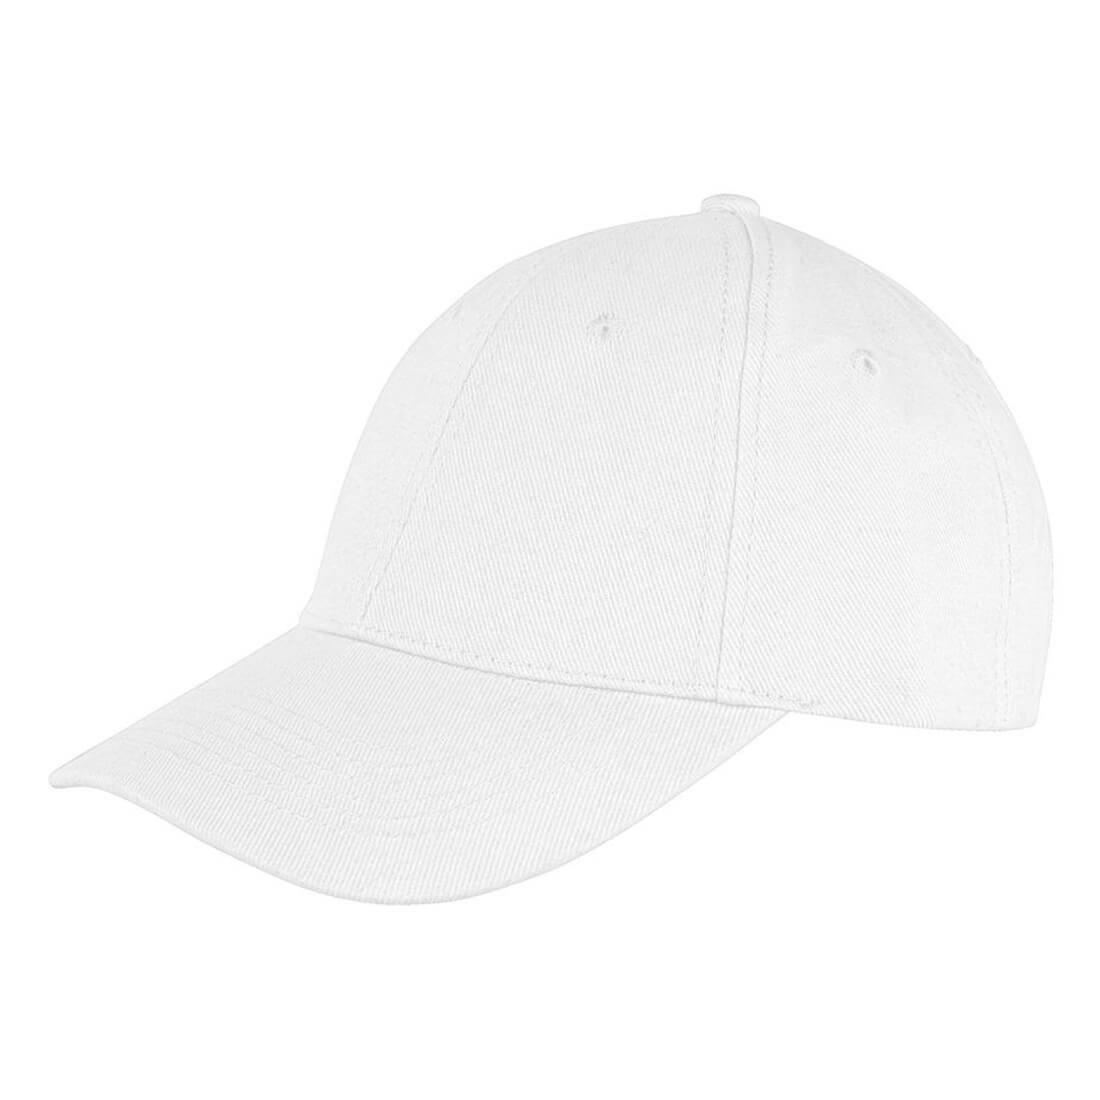 Sapca Low Profile Memphis 6 Panele - Imbracaminte de protectie